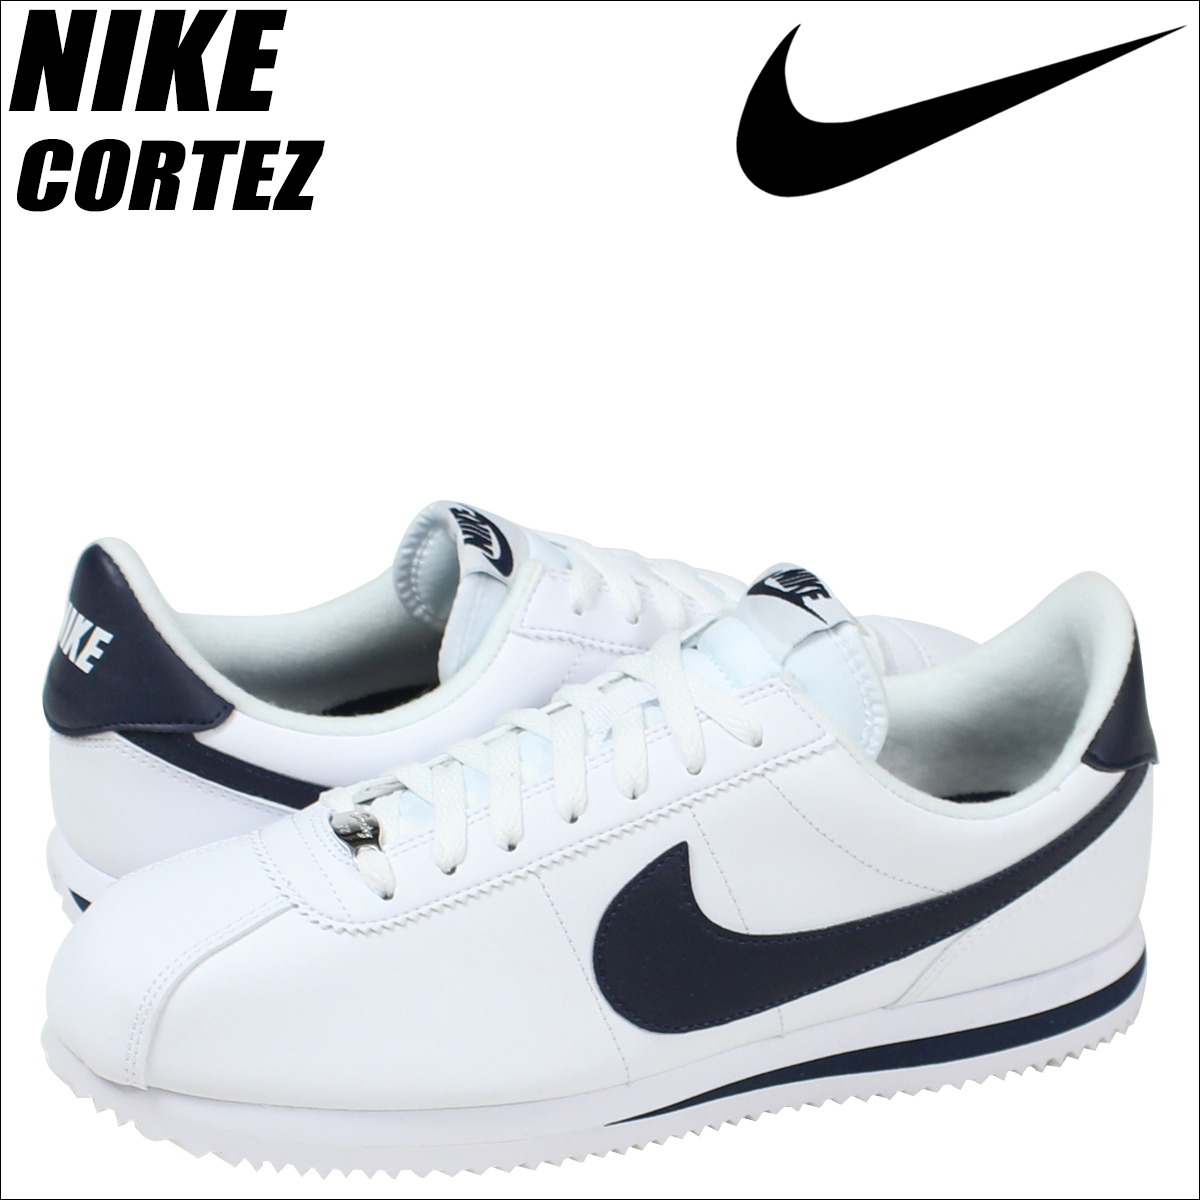 [SOLD OUT]耐克NIKE korutettsusunika CORTEZ BASIC LEATHER 819719-141人鞋白